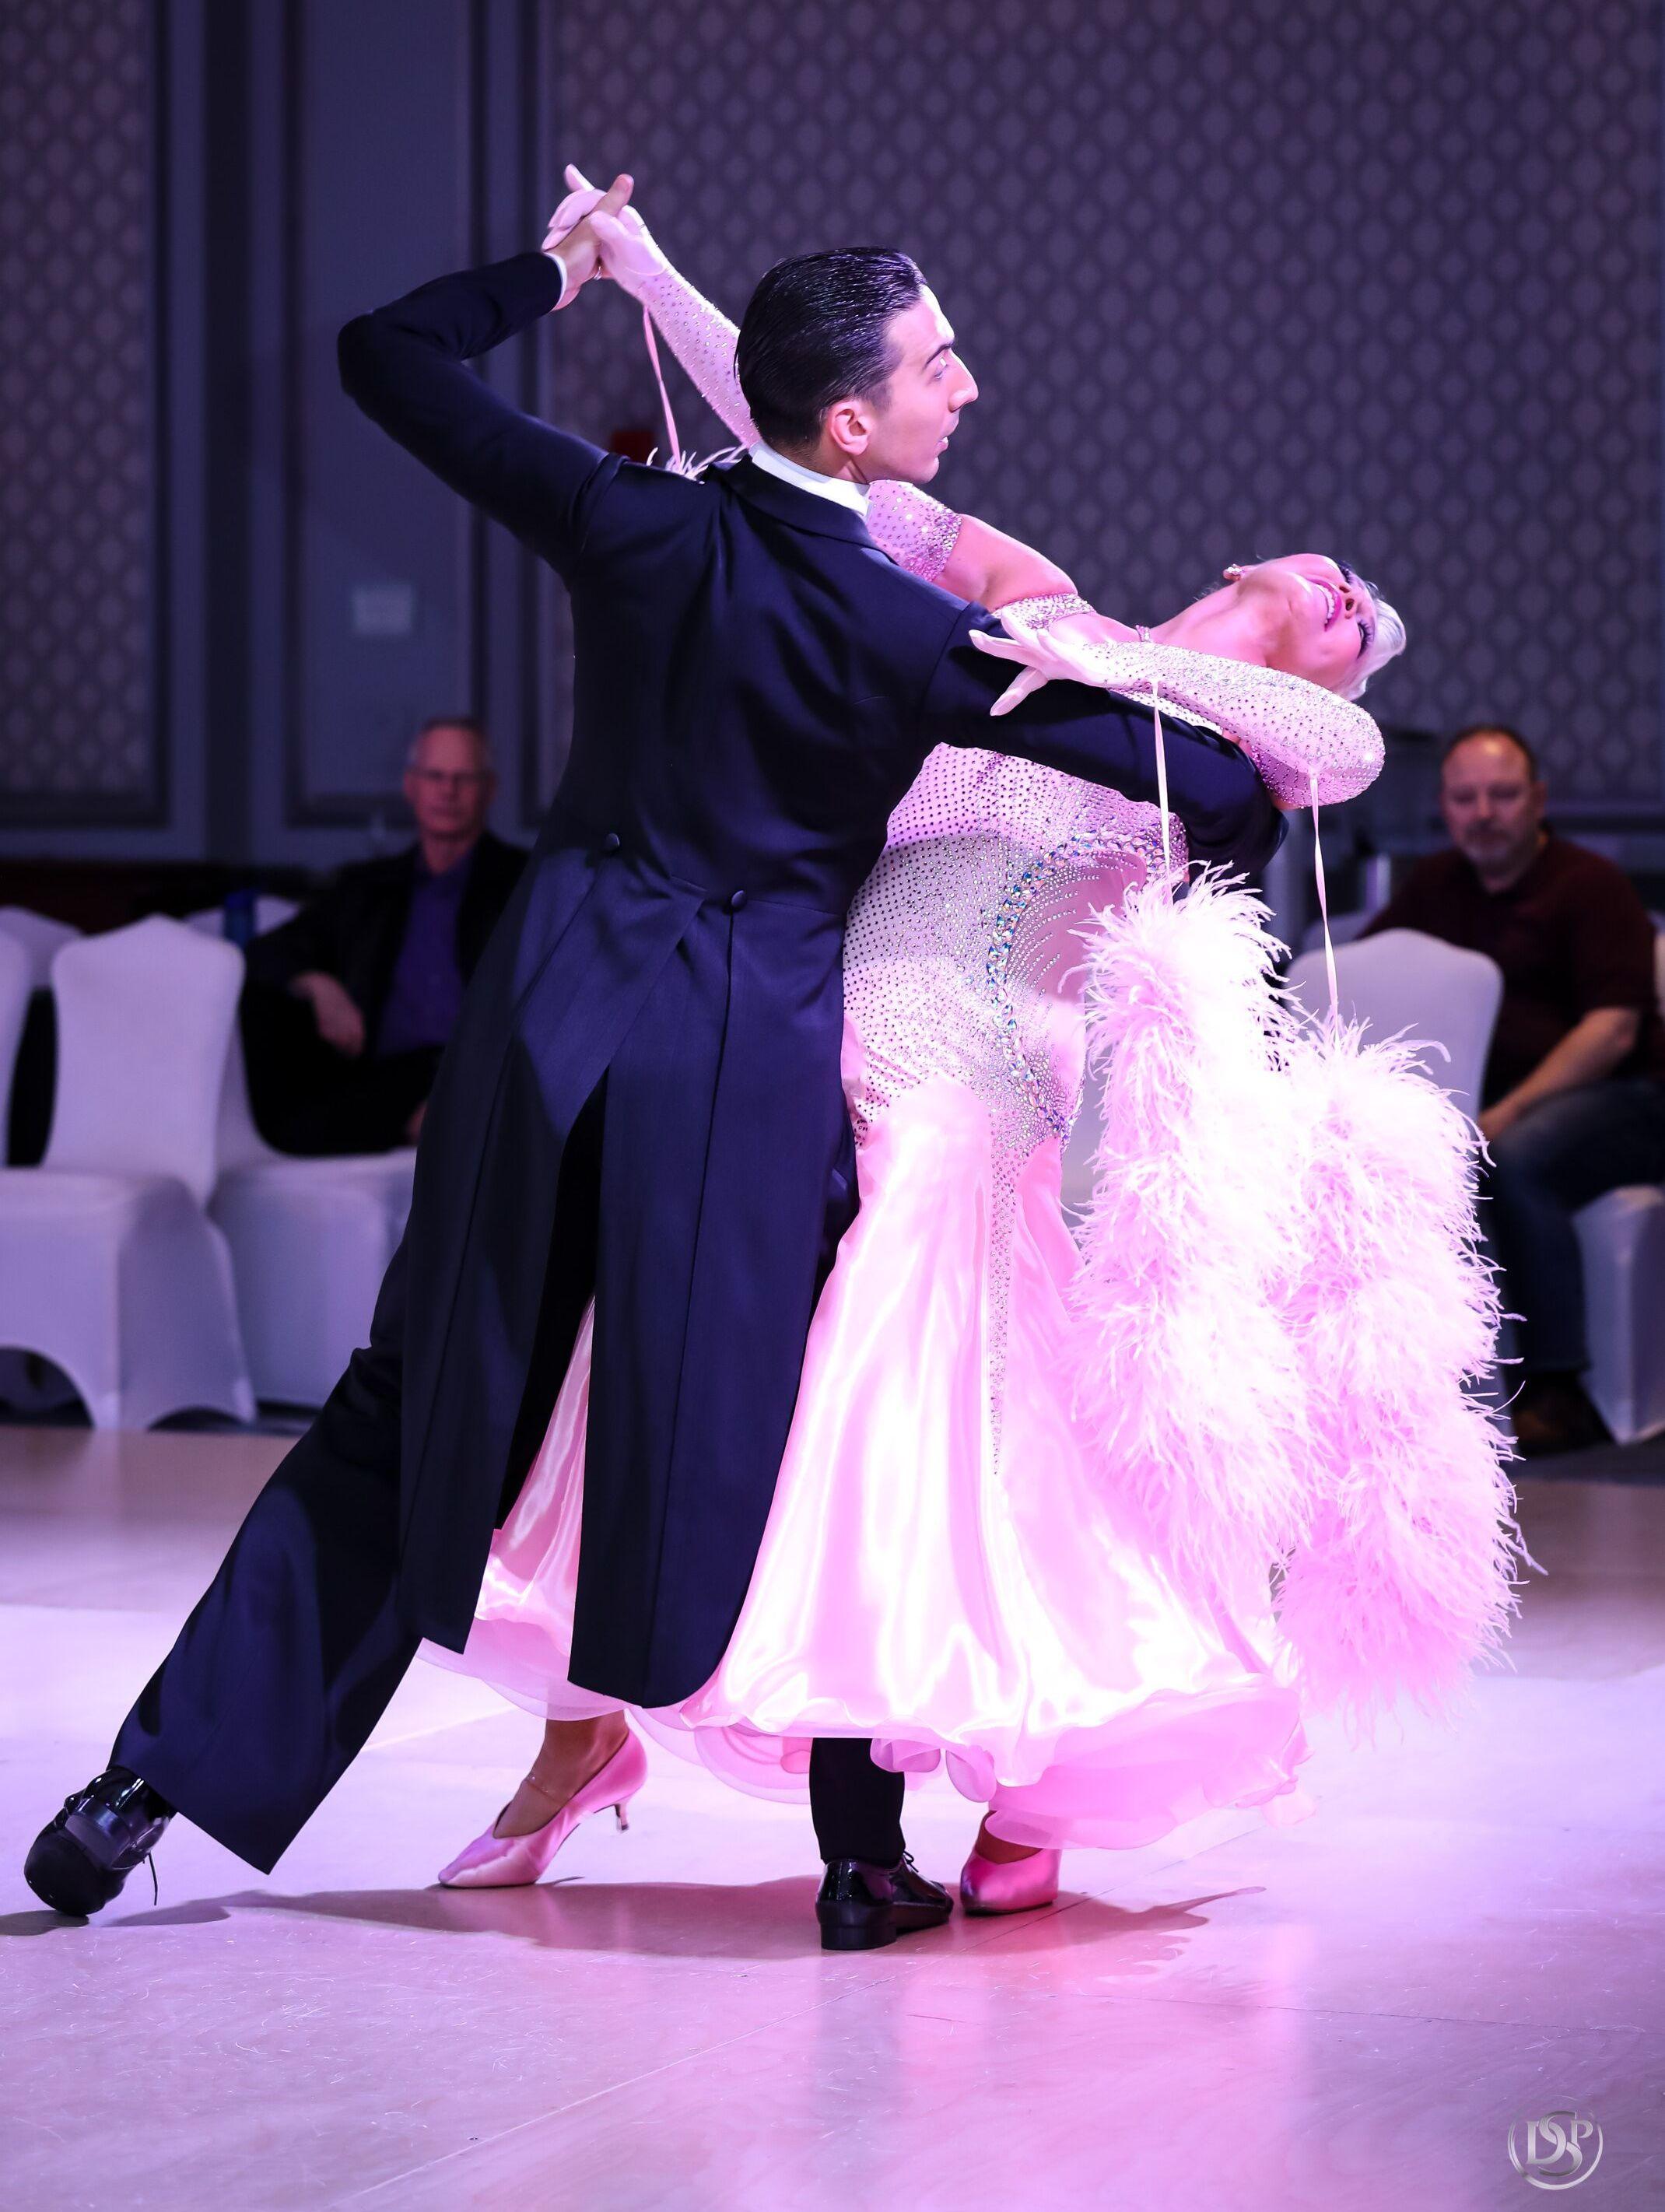 Charlene proctor and mikhail zharinov dance the